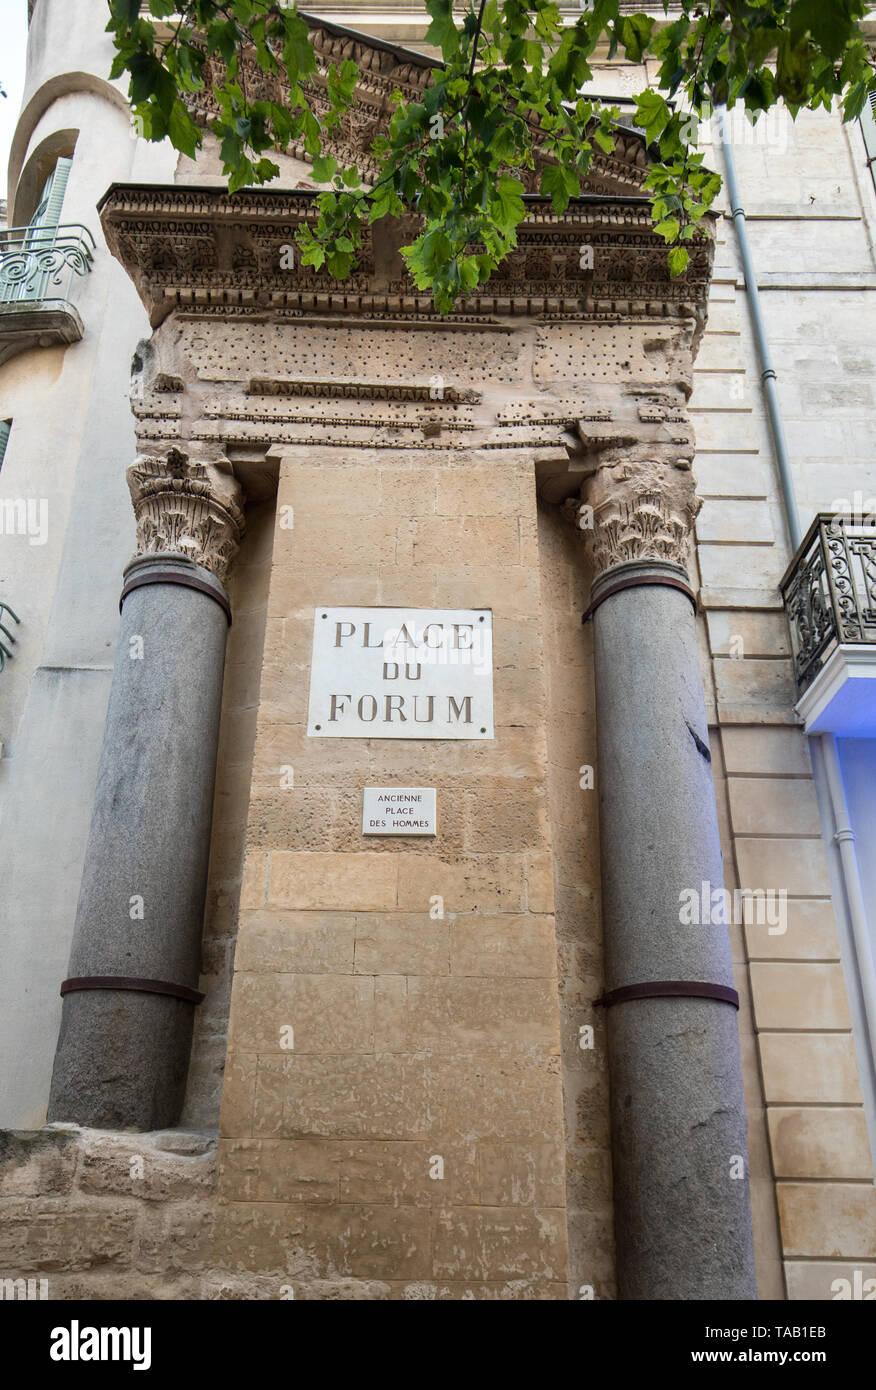 Arles, France - June 24, 2017:  Place du Forum in Arles, Provence, France Stock Photo